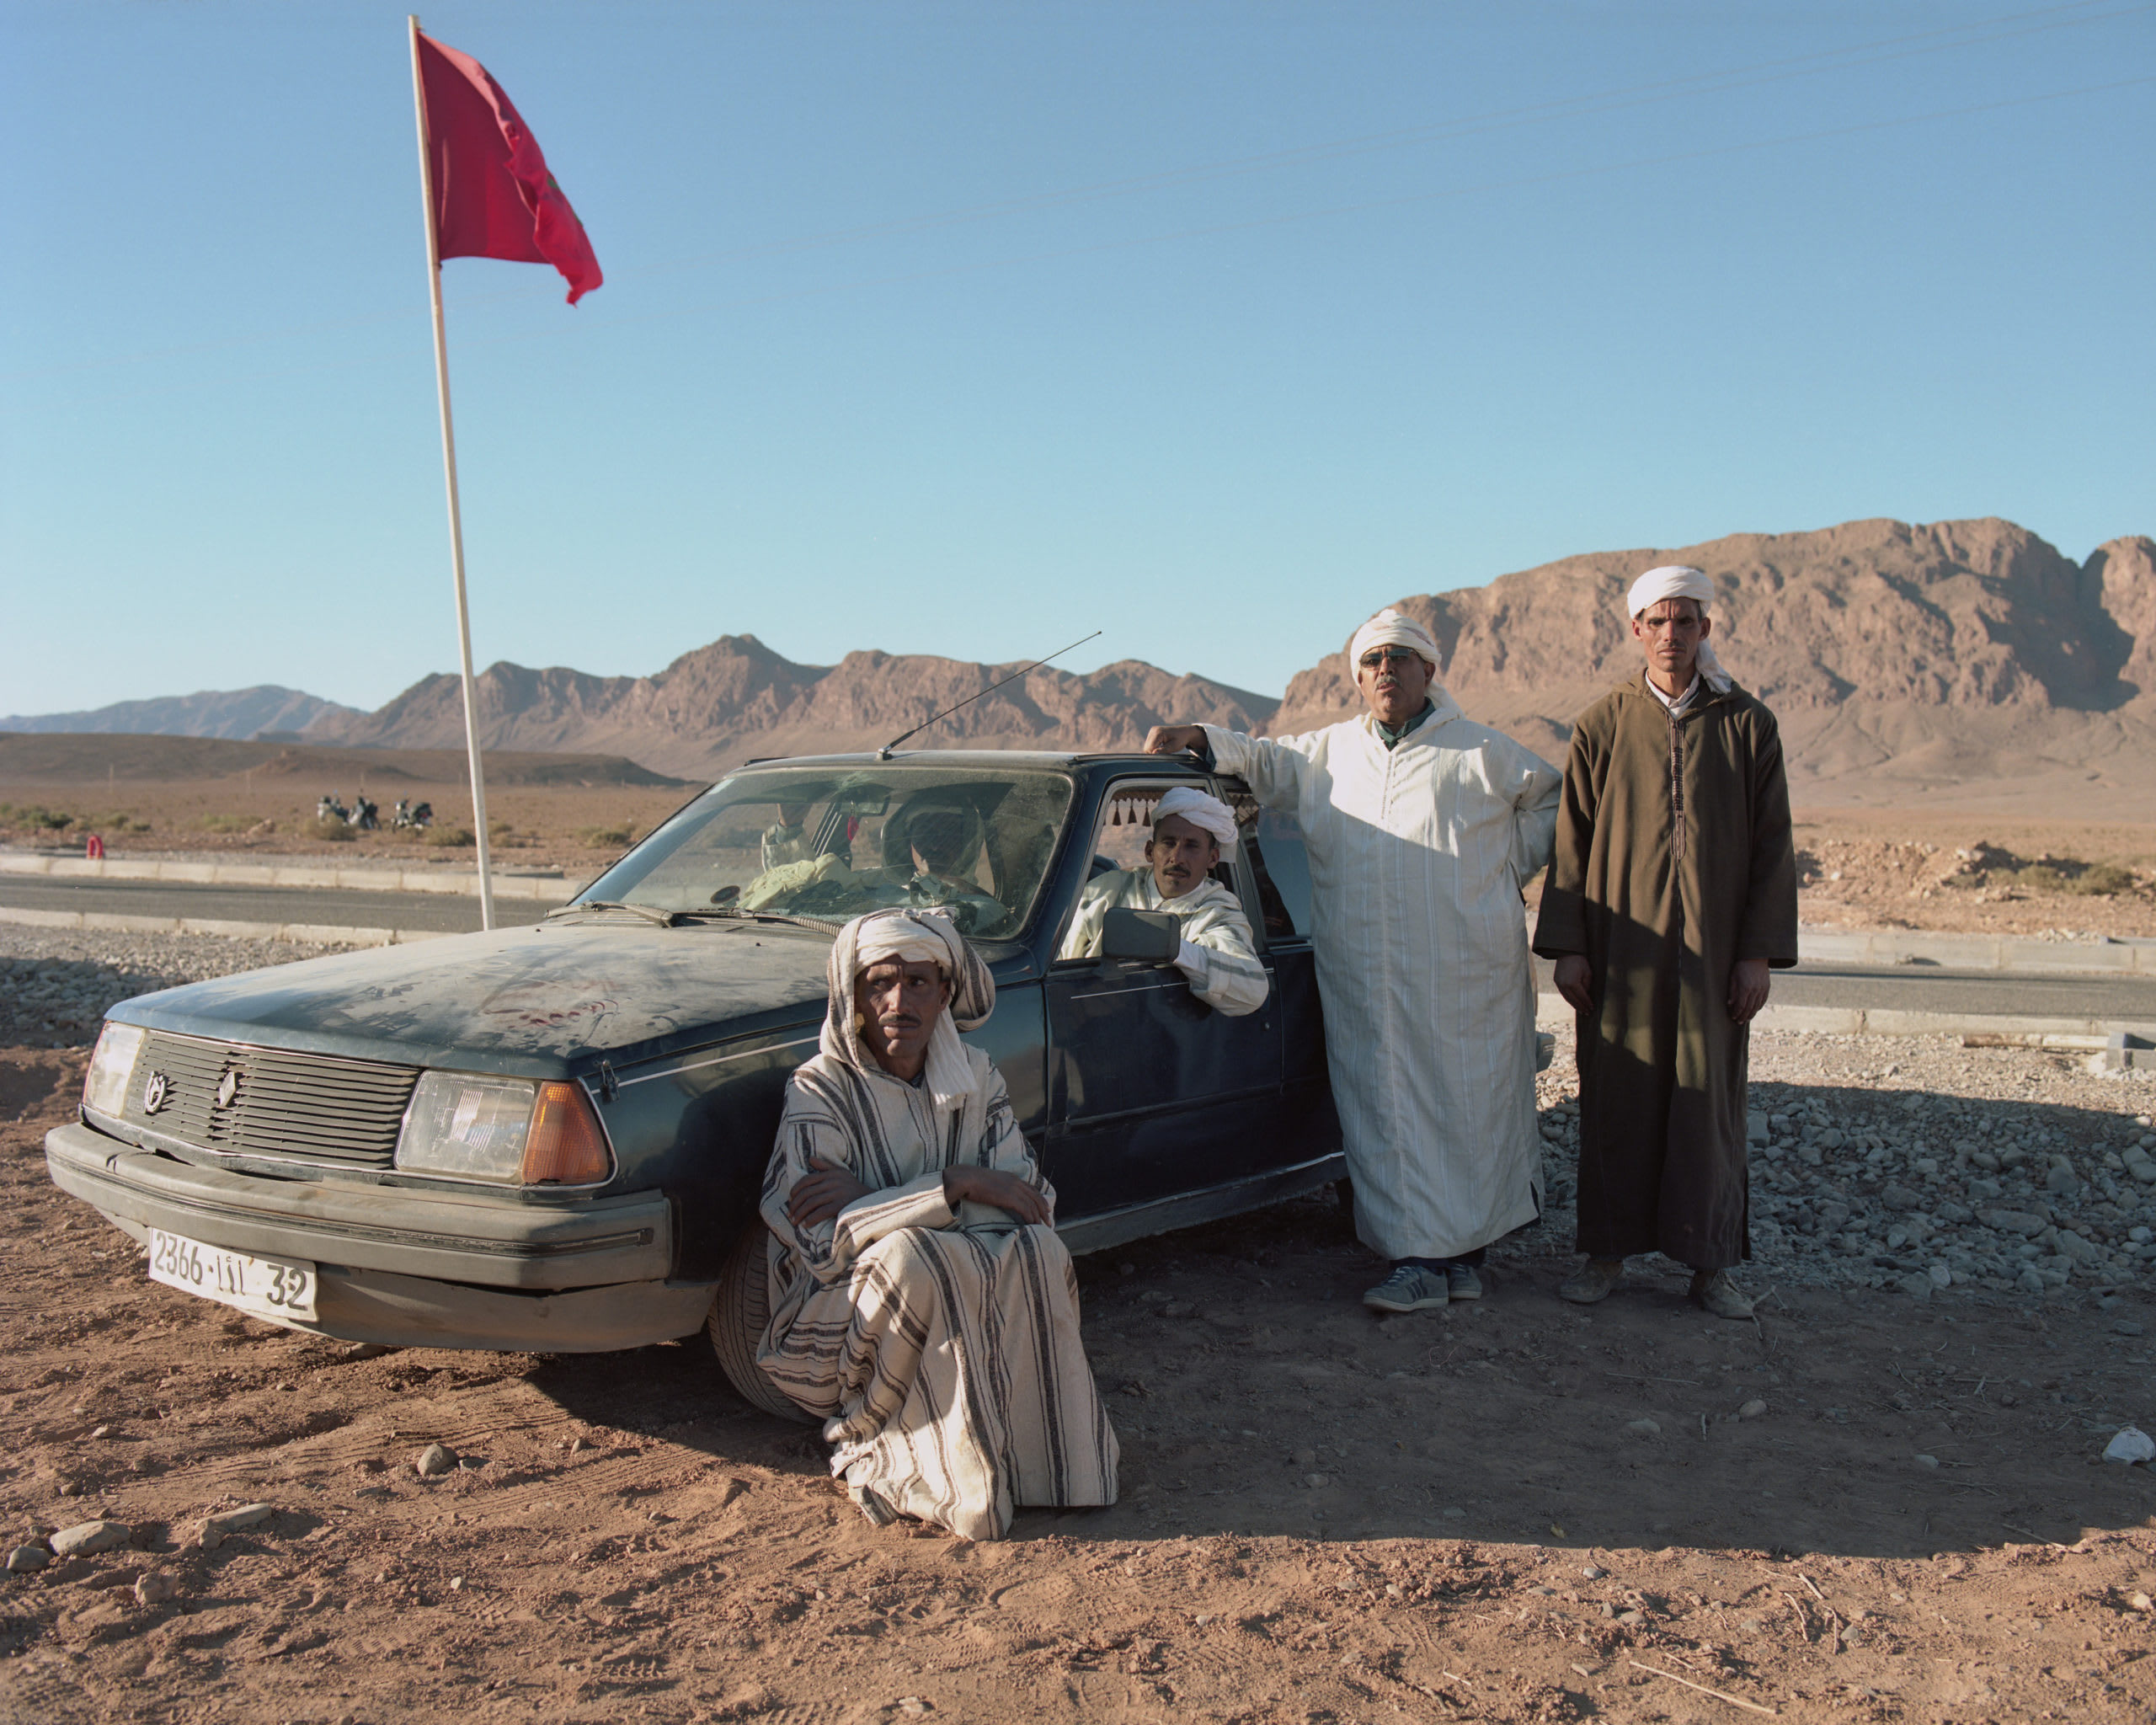 bidules-latest-prends soin de toi Victor Pattyn Maroc - view 0